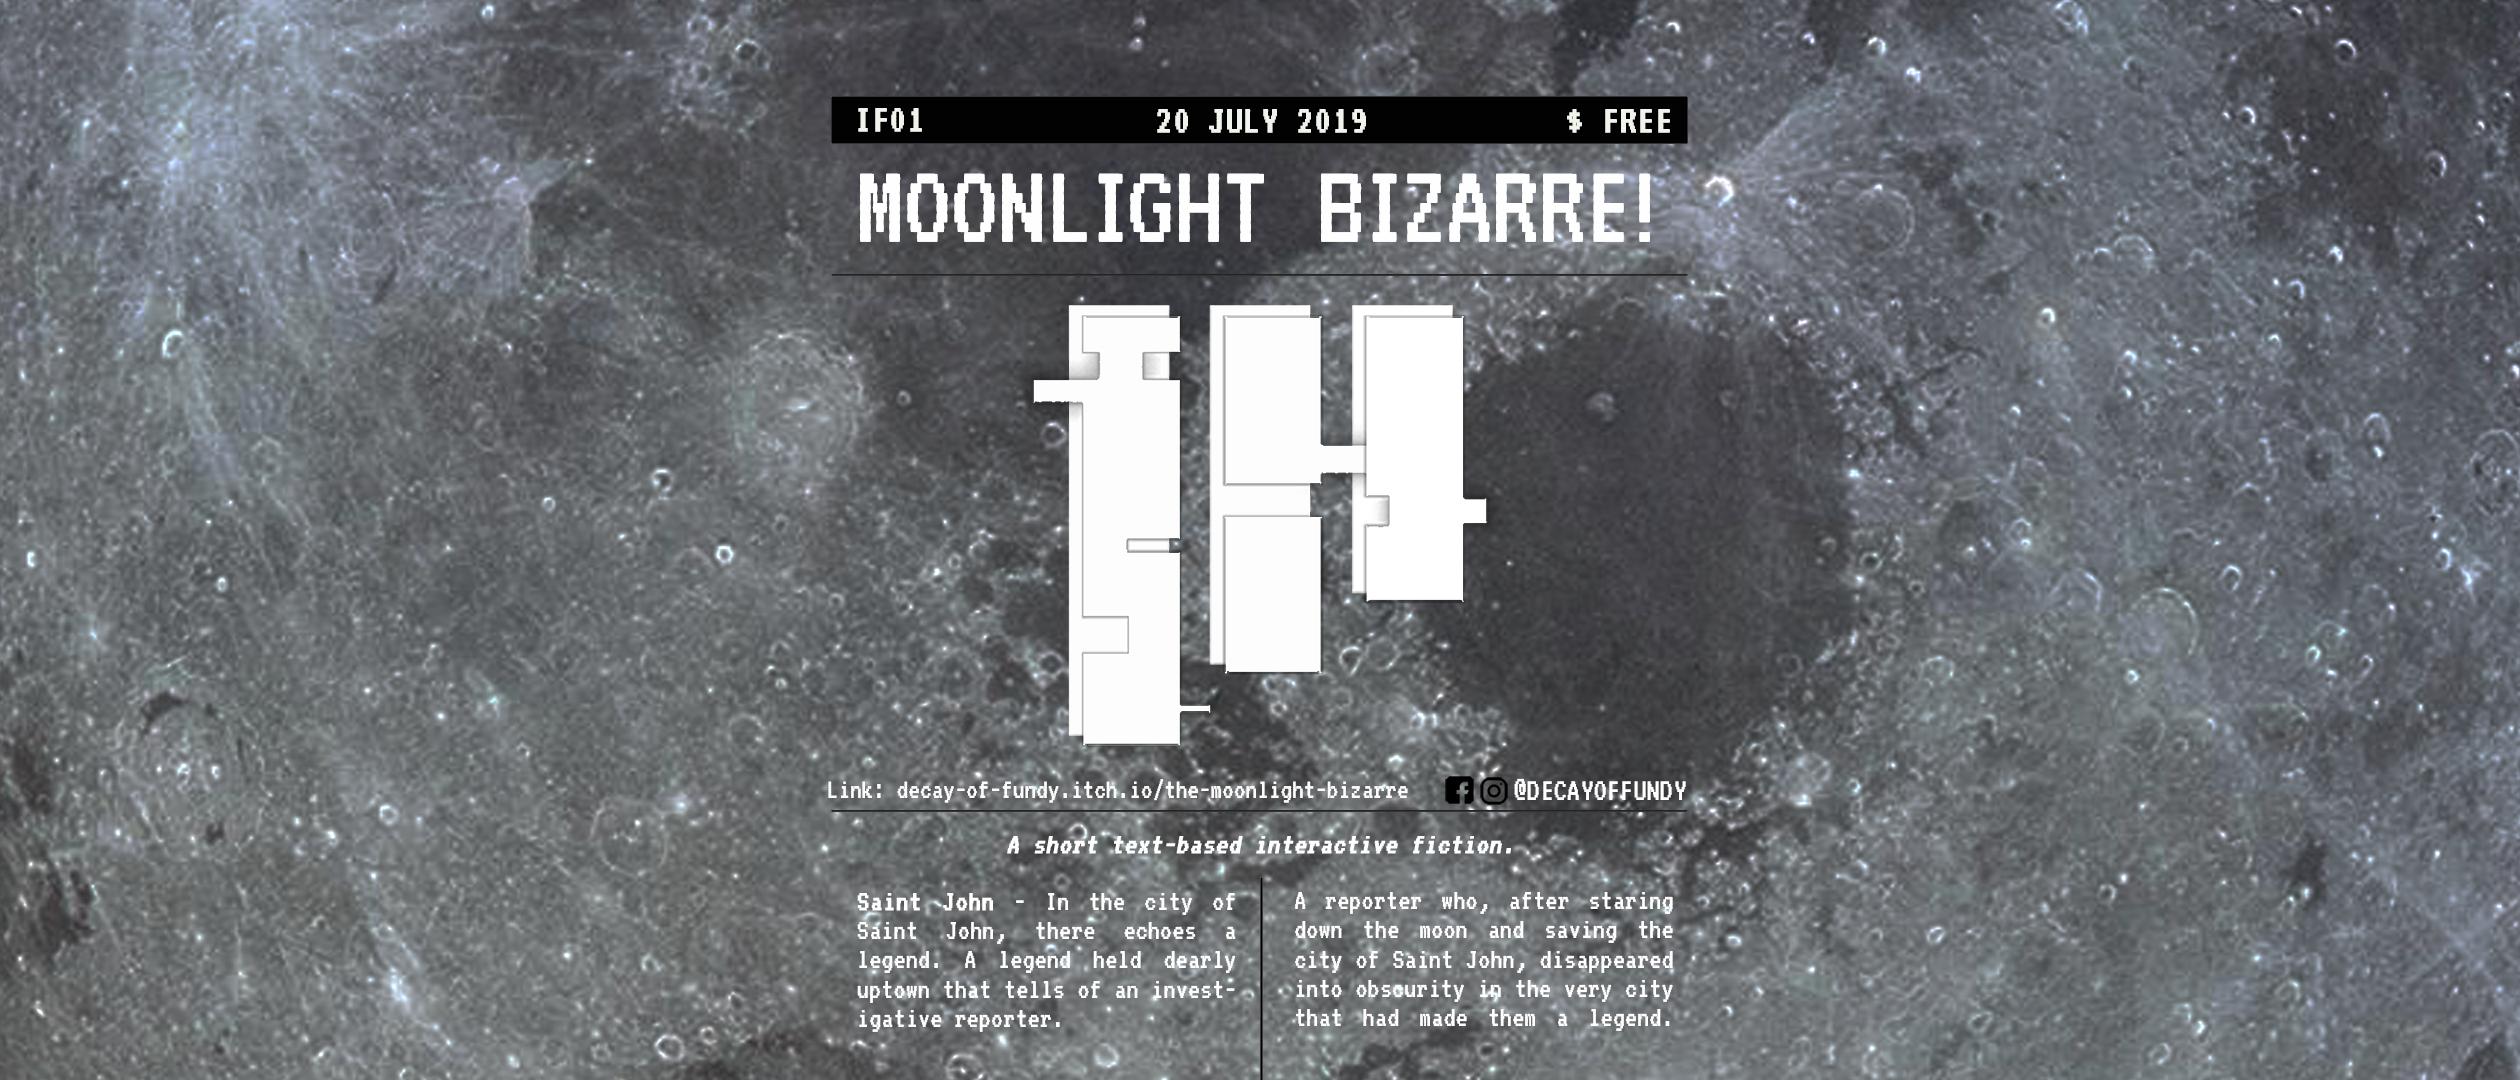 The Moonlight Bizarre